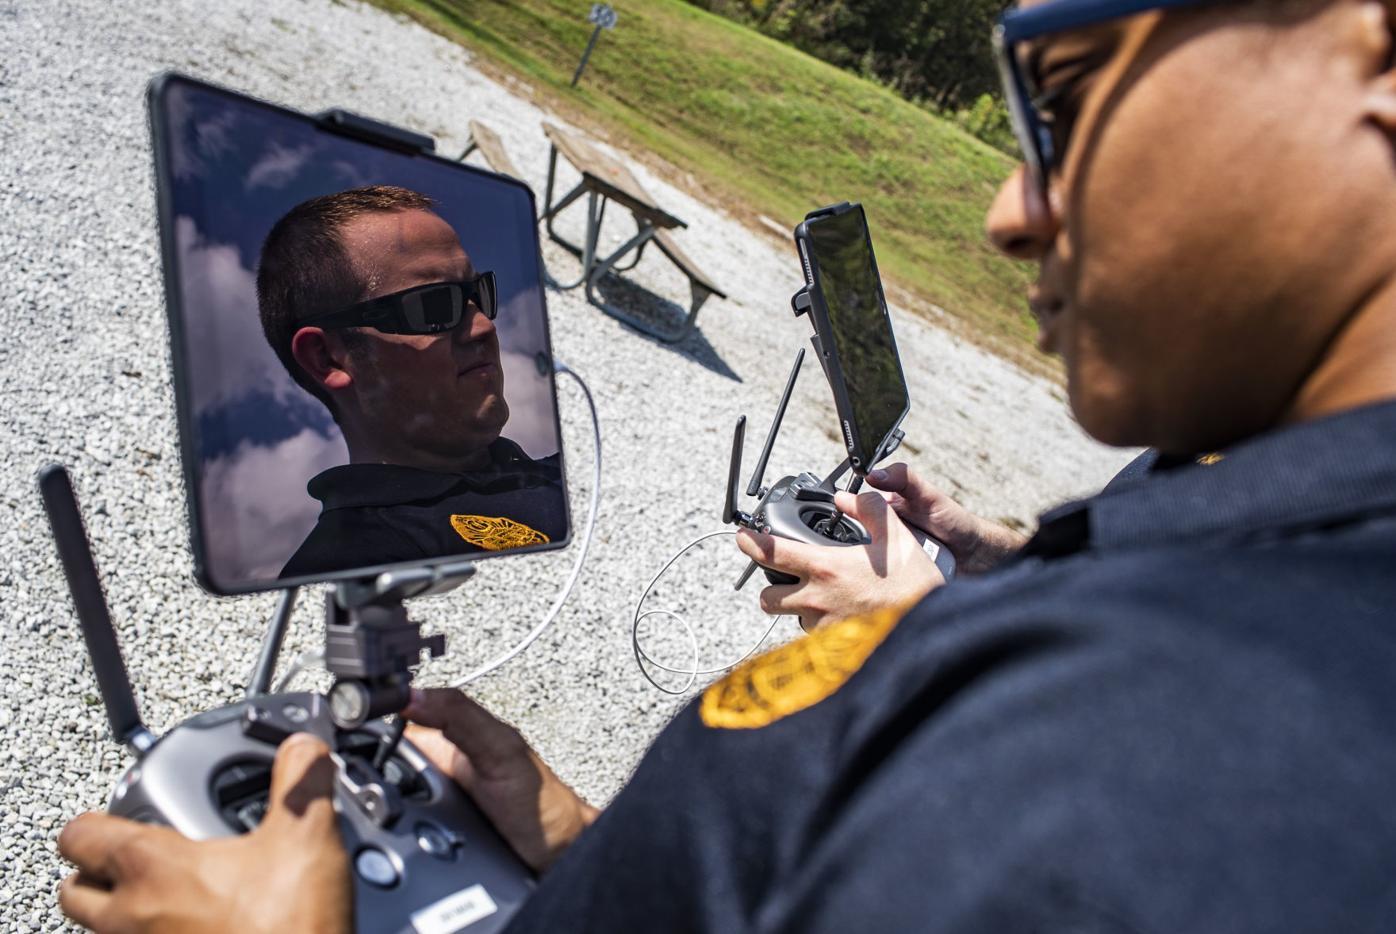 Police drone training